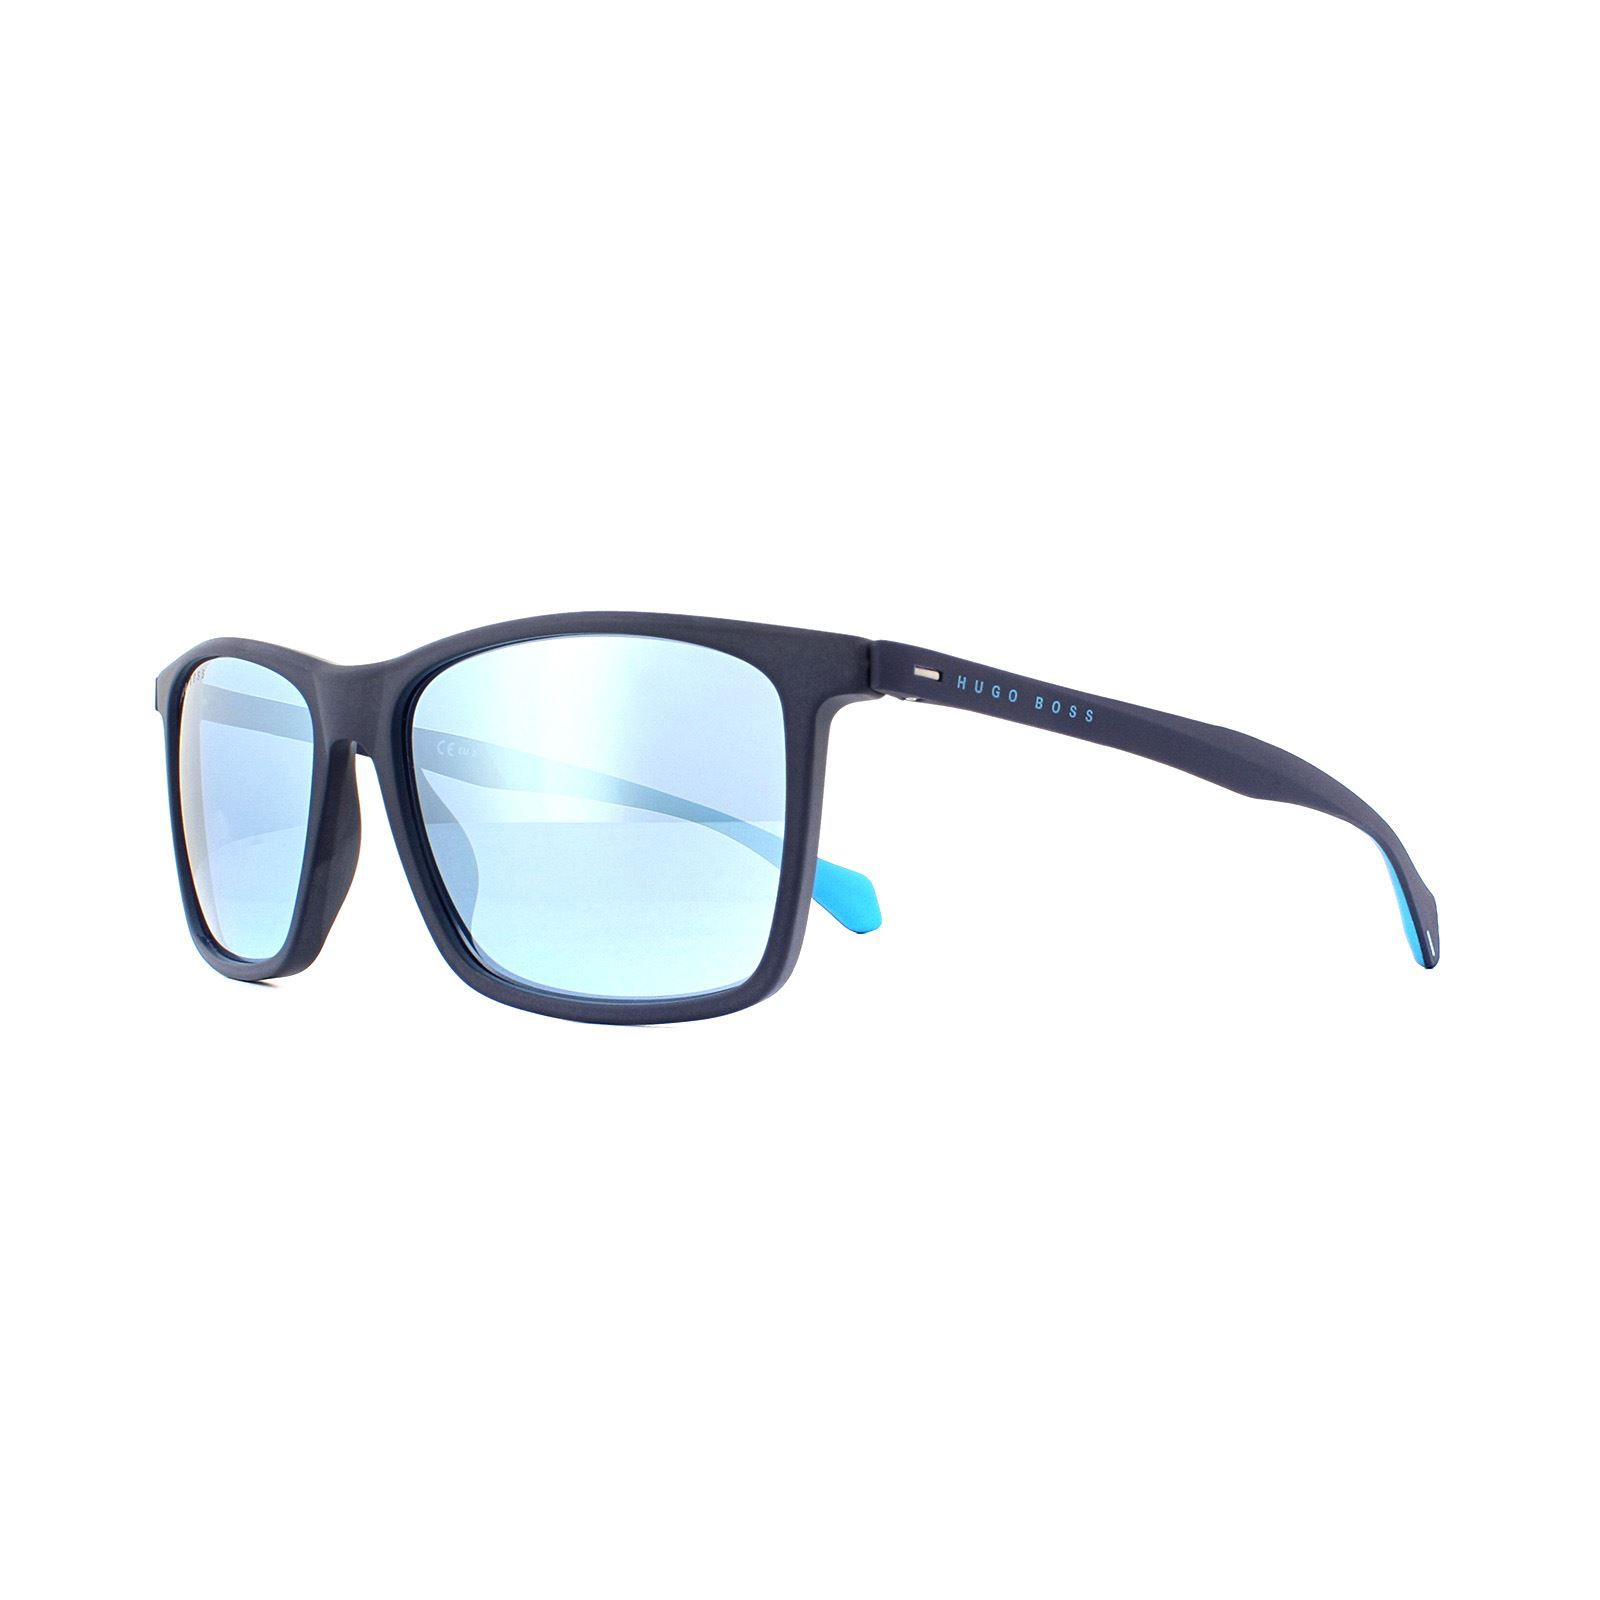 Hugo Boss Sunglasses BOSS 1078/S FLL 3J Matte Blue Blue Mirror